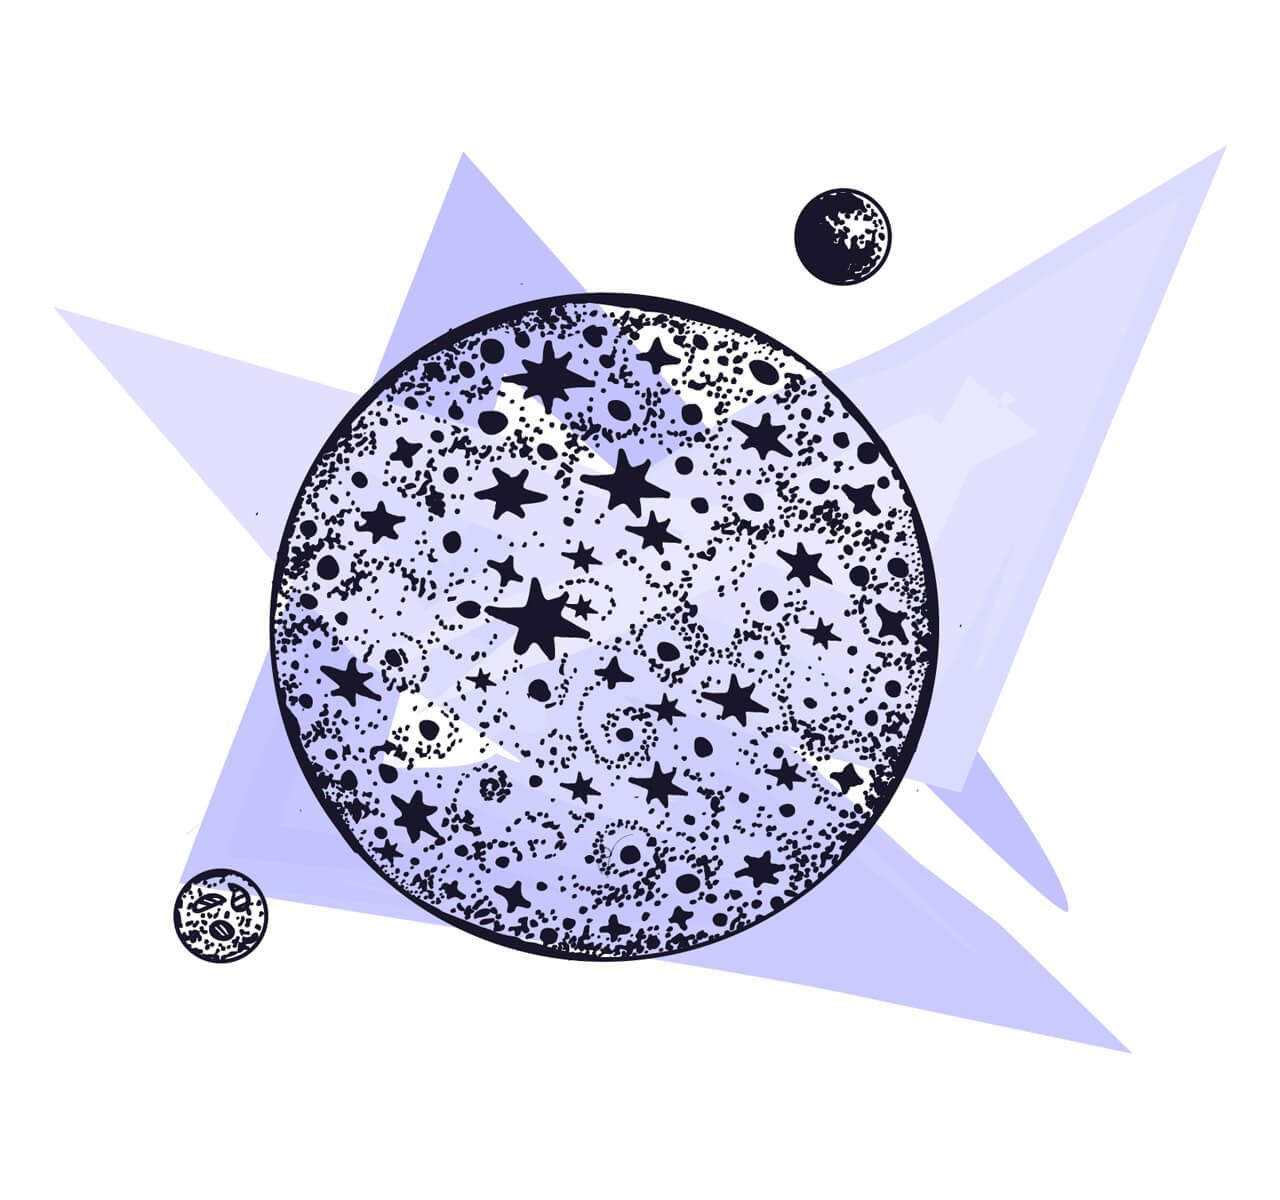 Rytų horoskopas